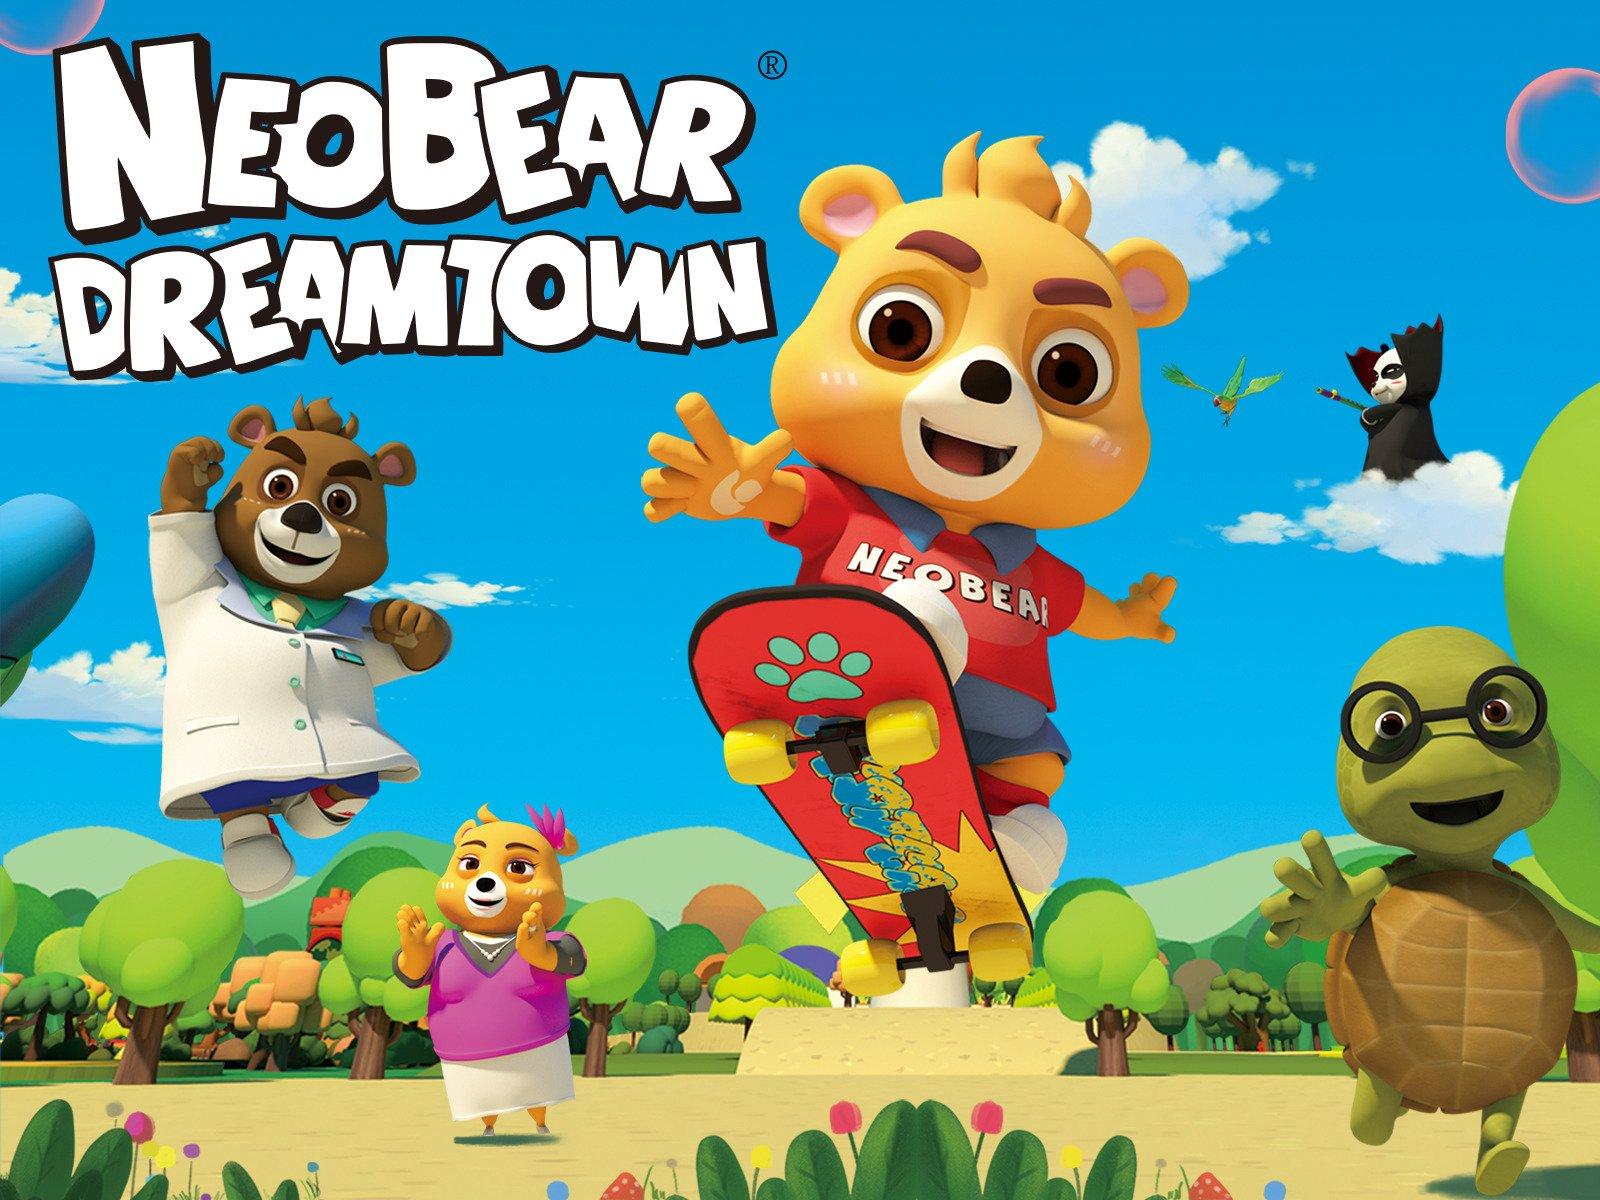 Neobear Dreamtown - Season 1